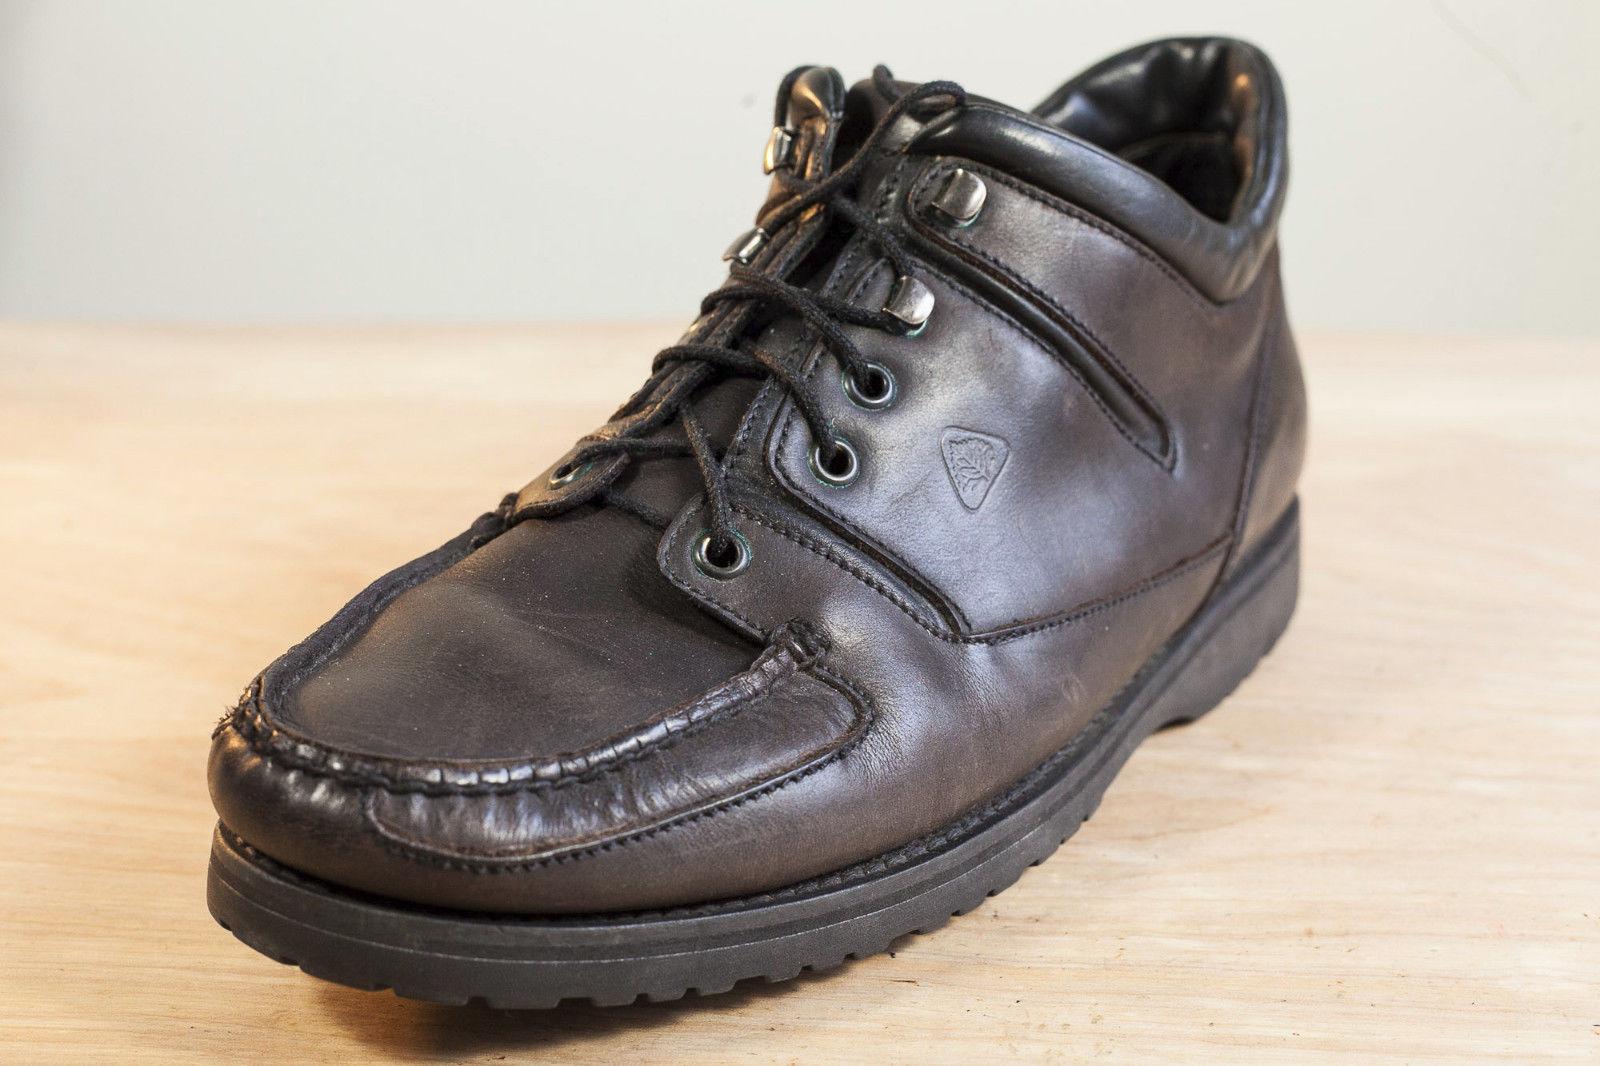 mens florsheim shoes 10-50r to 10-30r